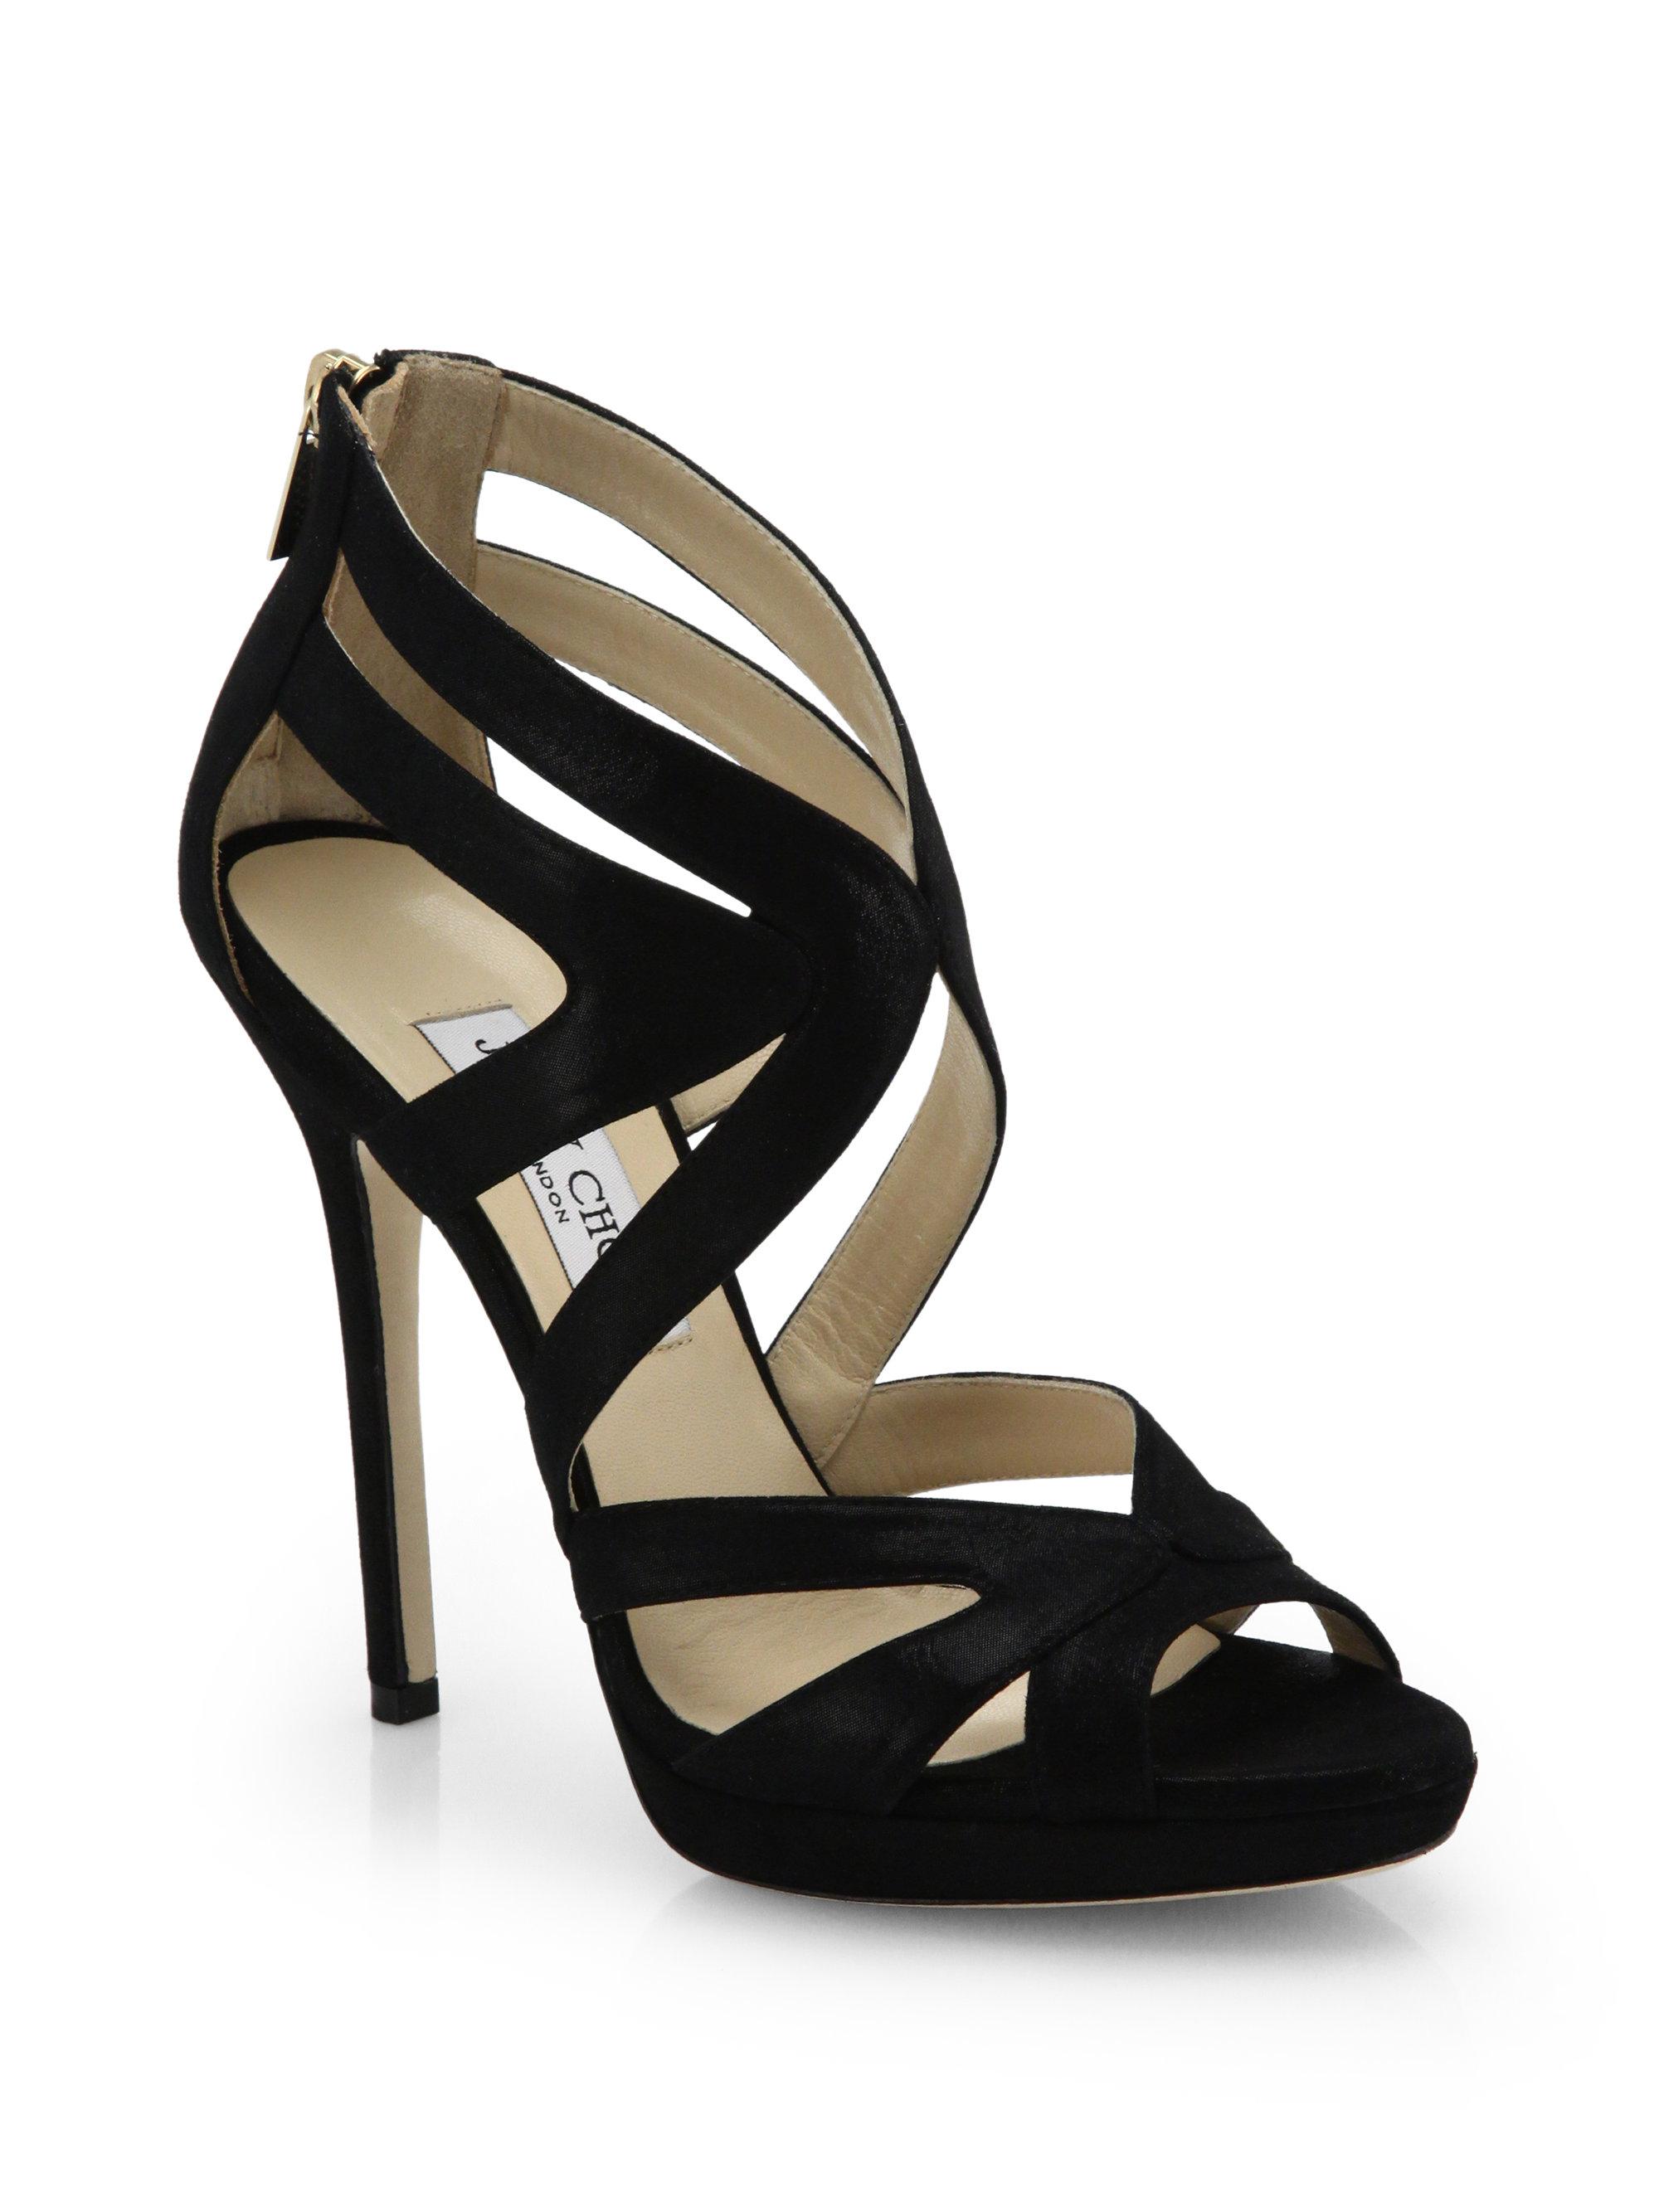 cde3bd82aea5 Lyst - Jimmy Choo Collar Shimmer Suede Platform Sandals in Black